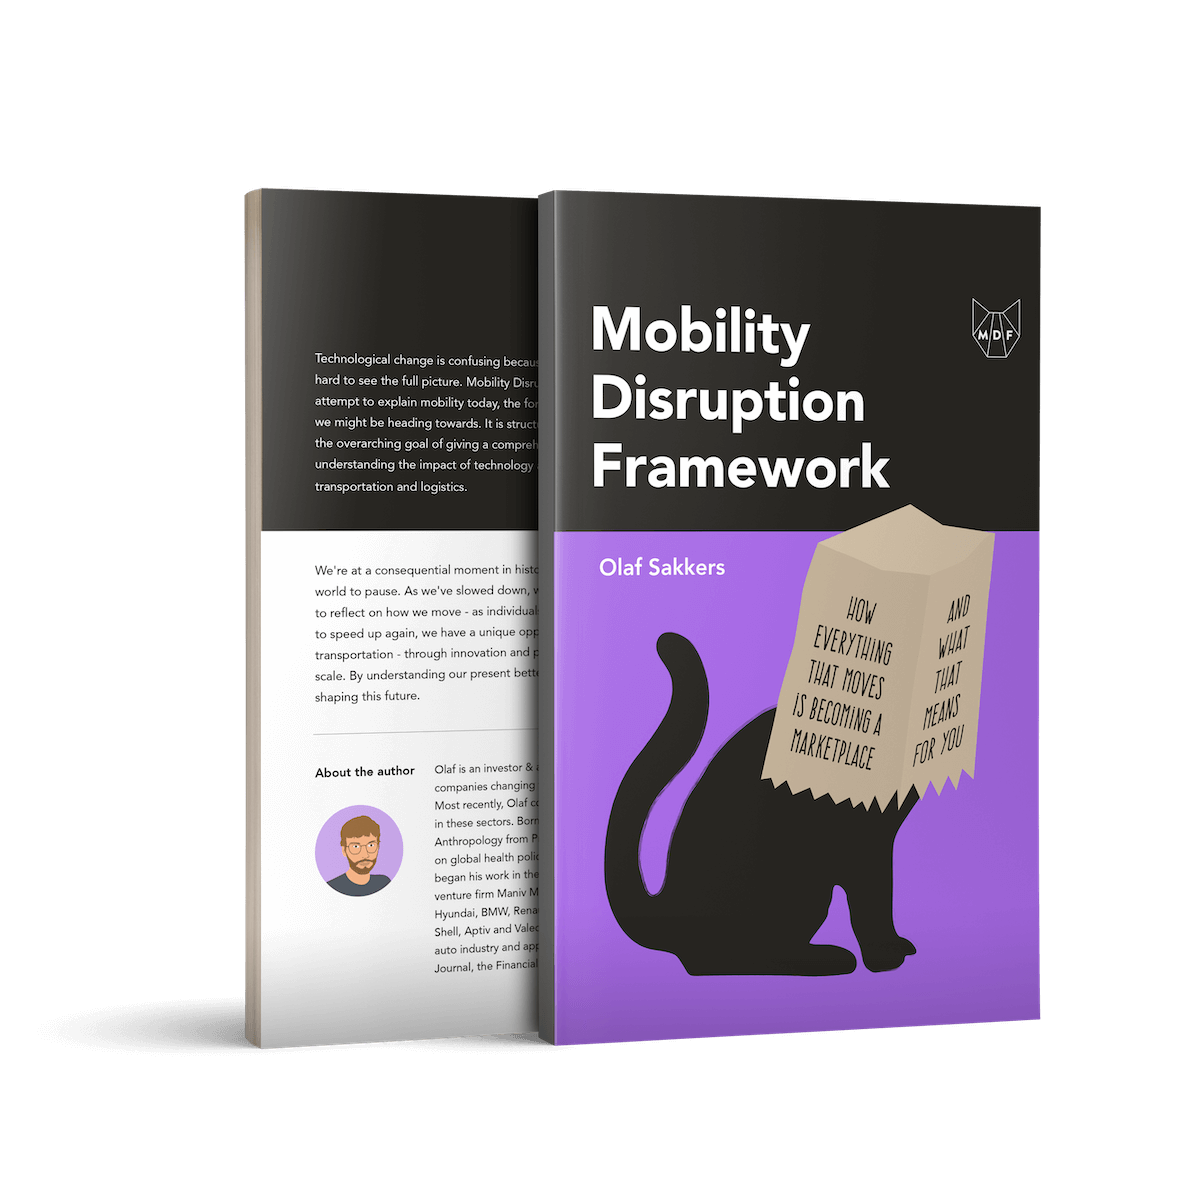 Mobility Disruption Framework book rendering